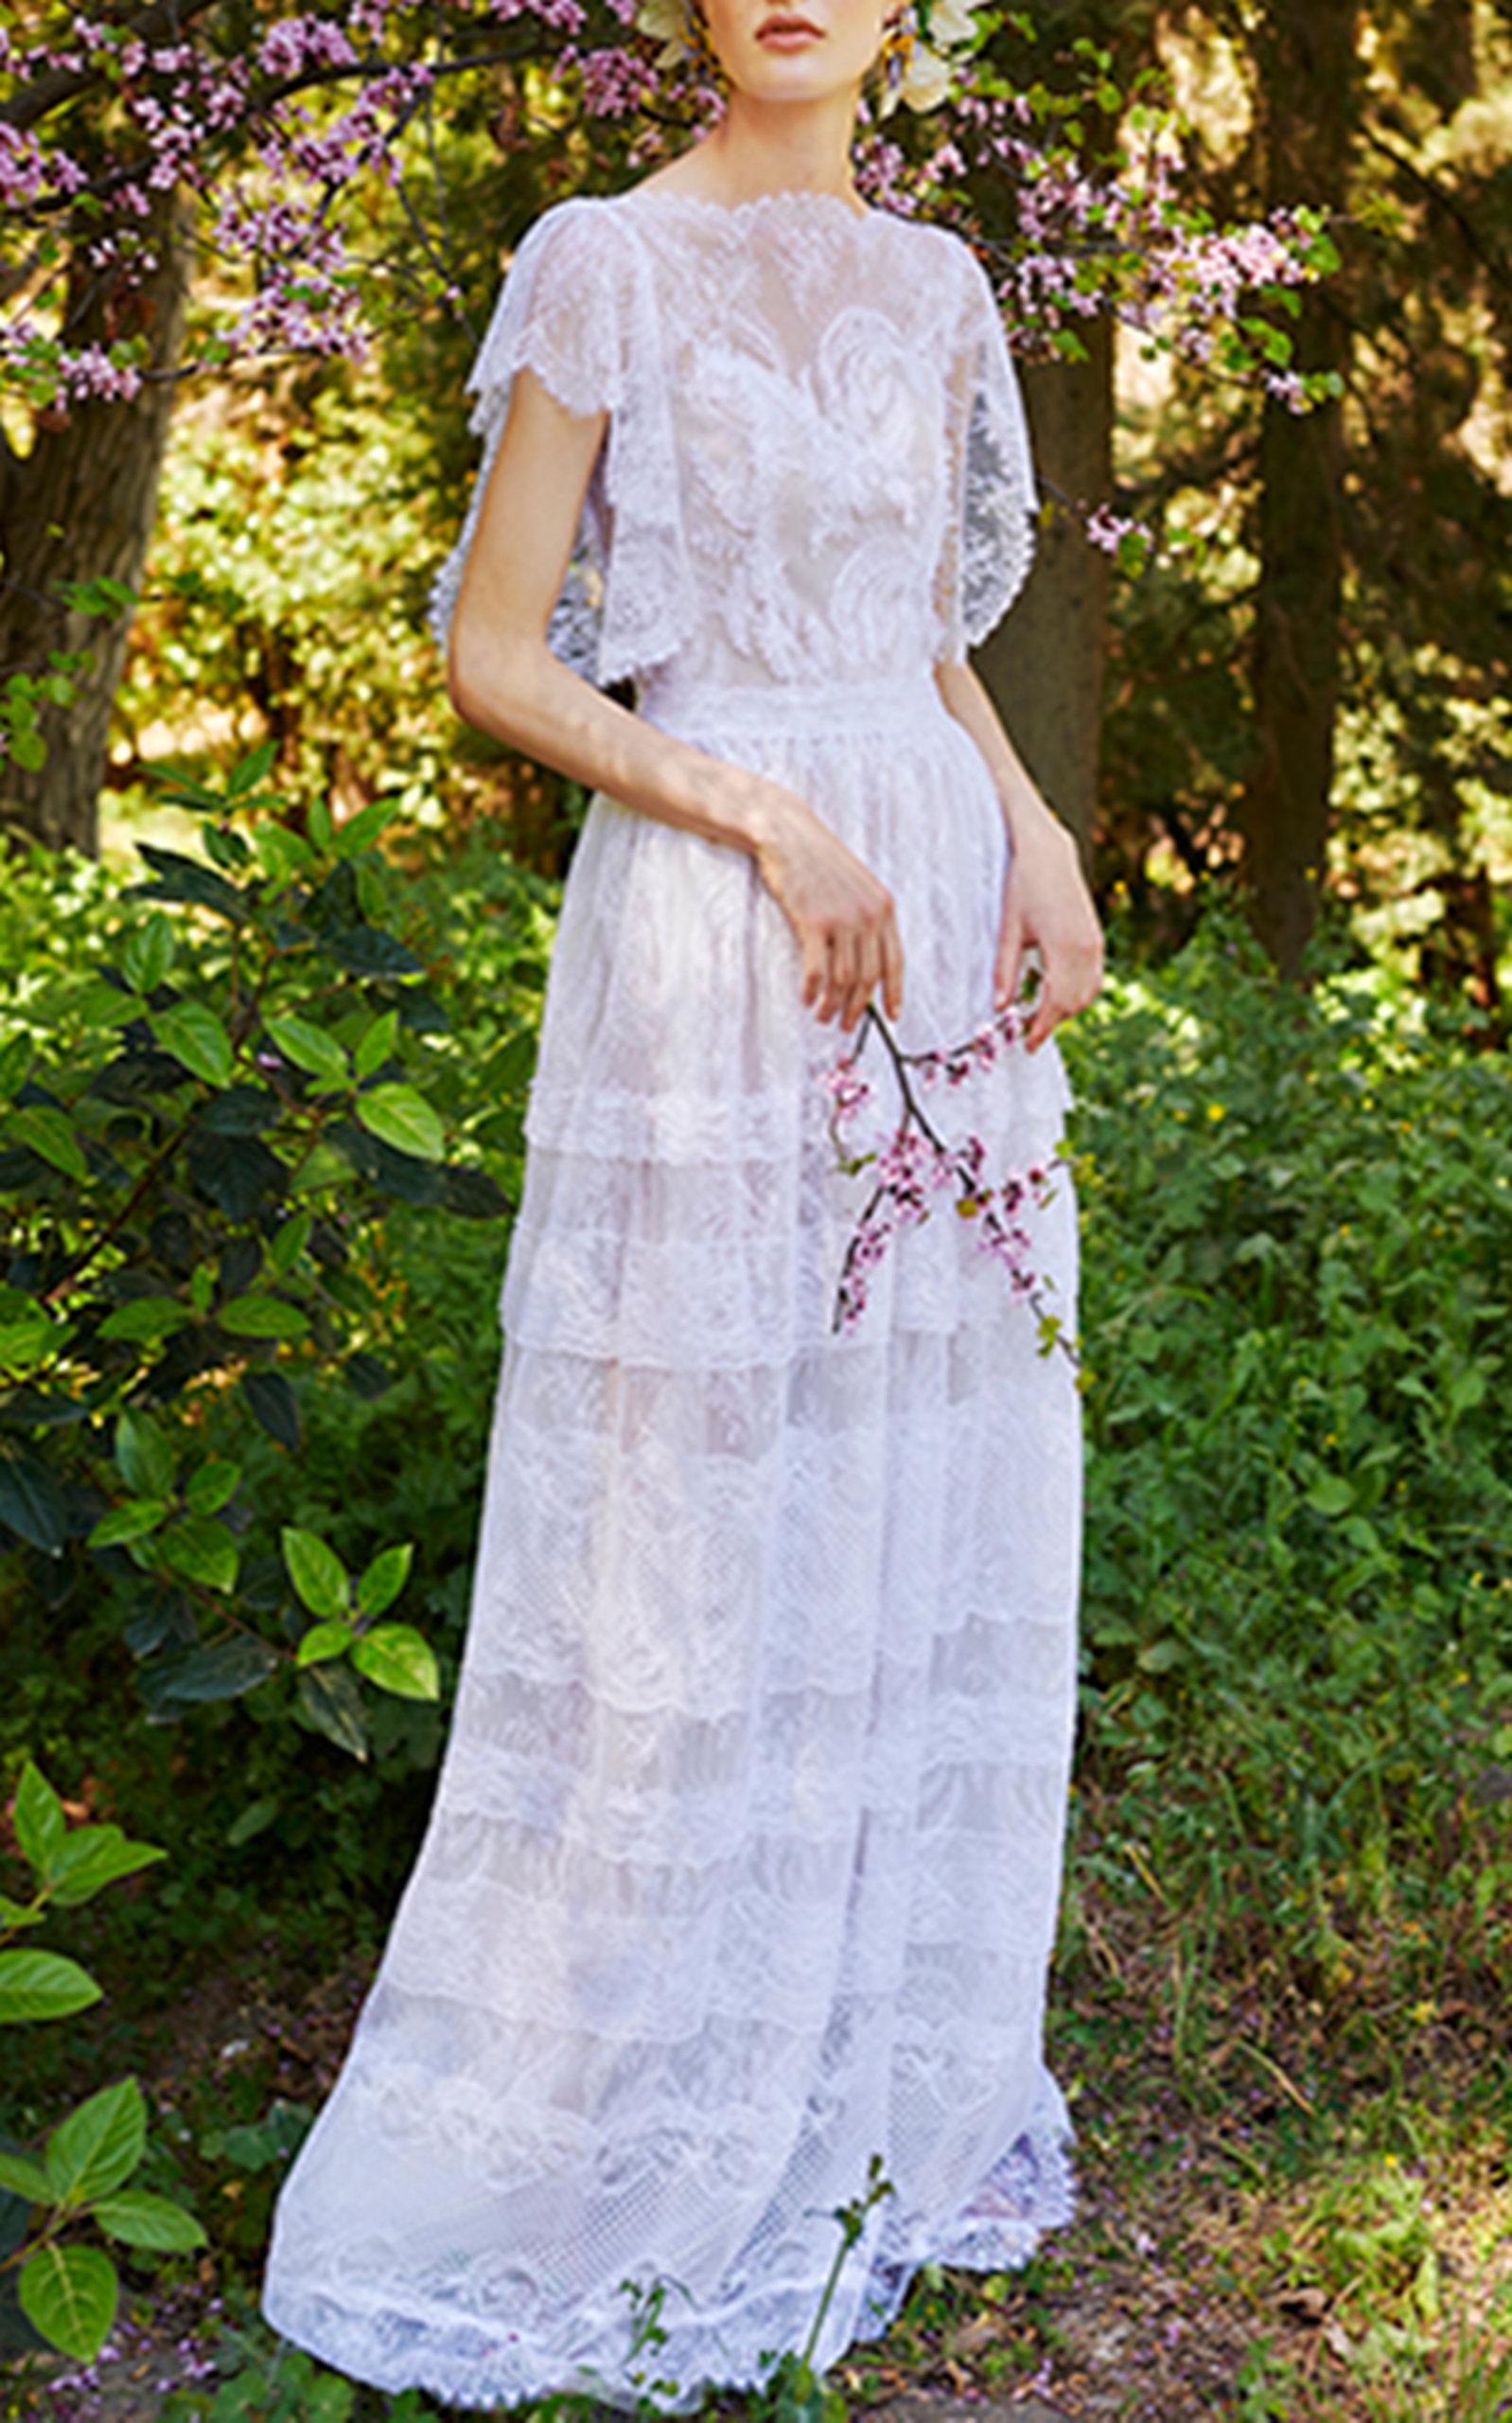 COSTARELLOS BRIDAL NEOROMANTIC CHANTILLY LACE DRESS